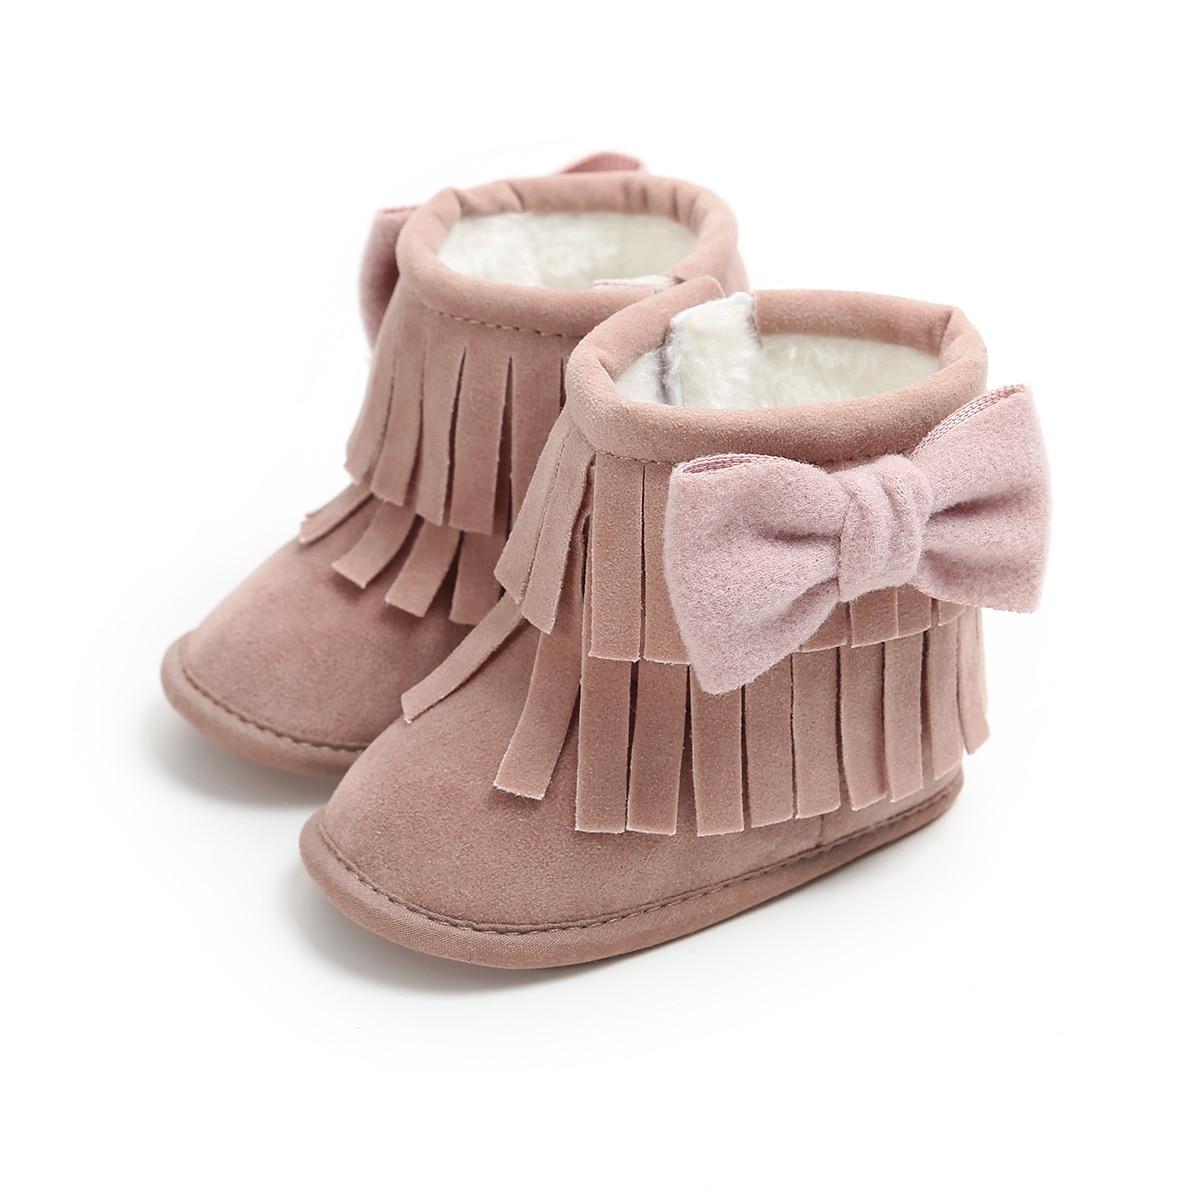 Purple Bow-knot Tassel Leather Snow Boots Winter Newborn Girl Boy Shoes Non-slip Prewalker Booties Baby Shoes 0-18 Months.CX154B